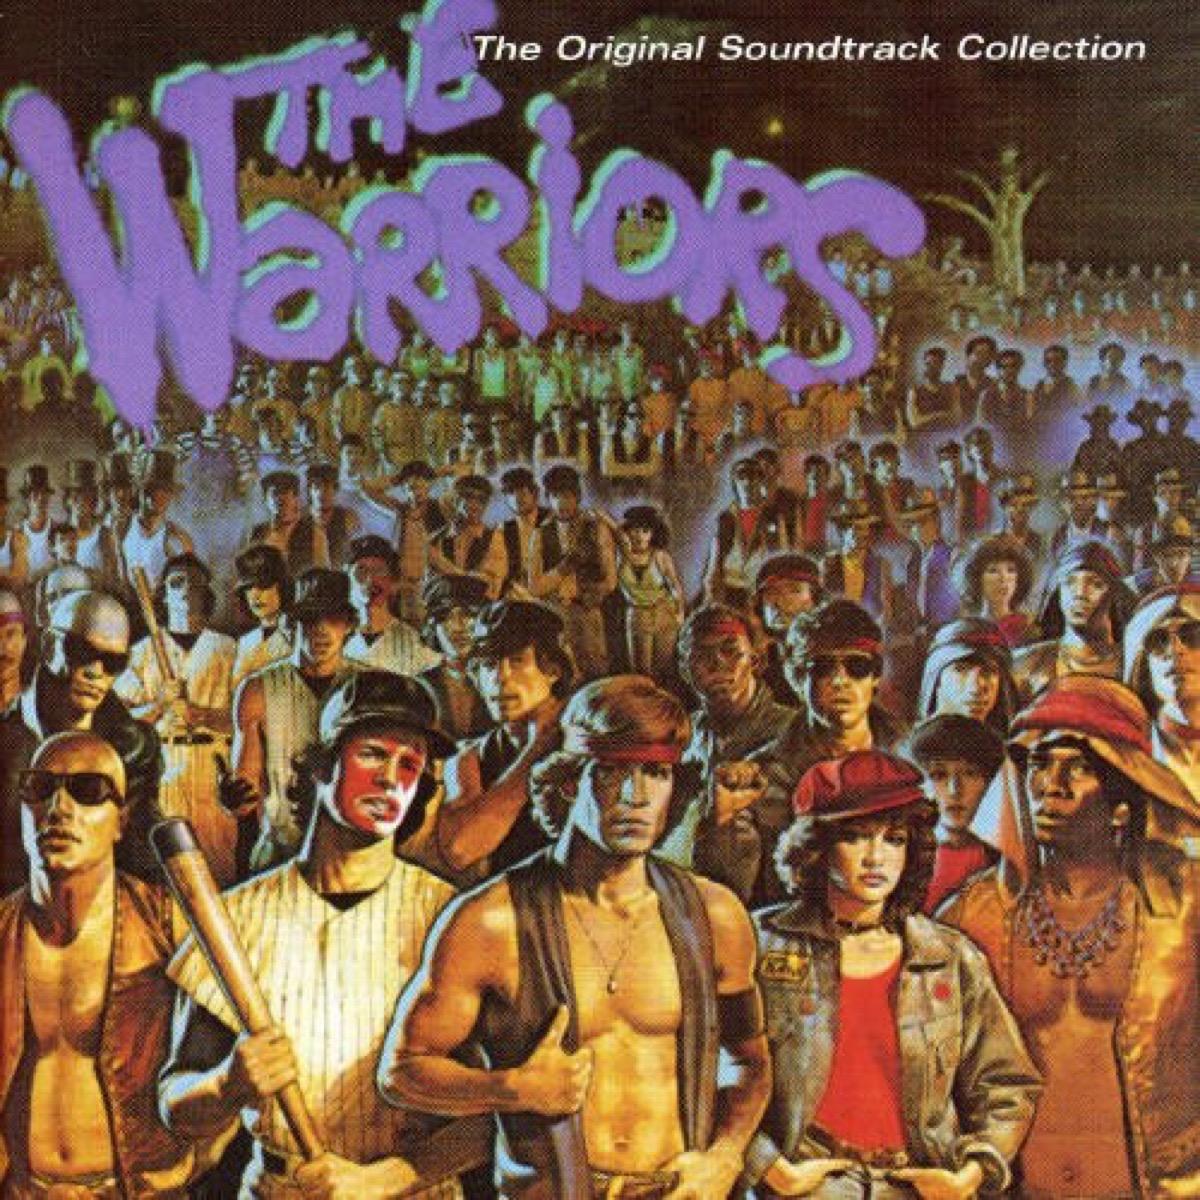 the warriors movie soundtrack